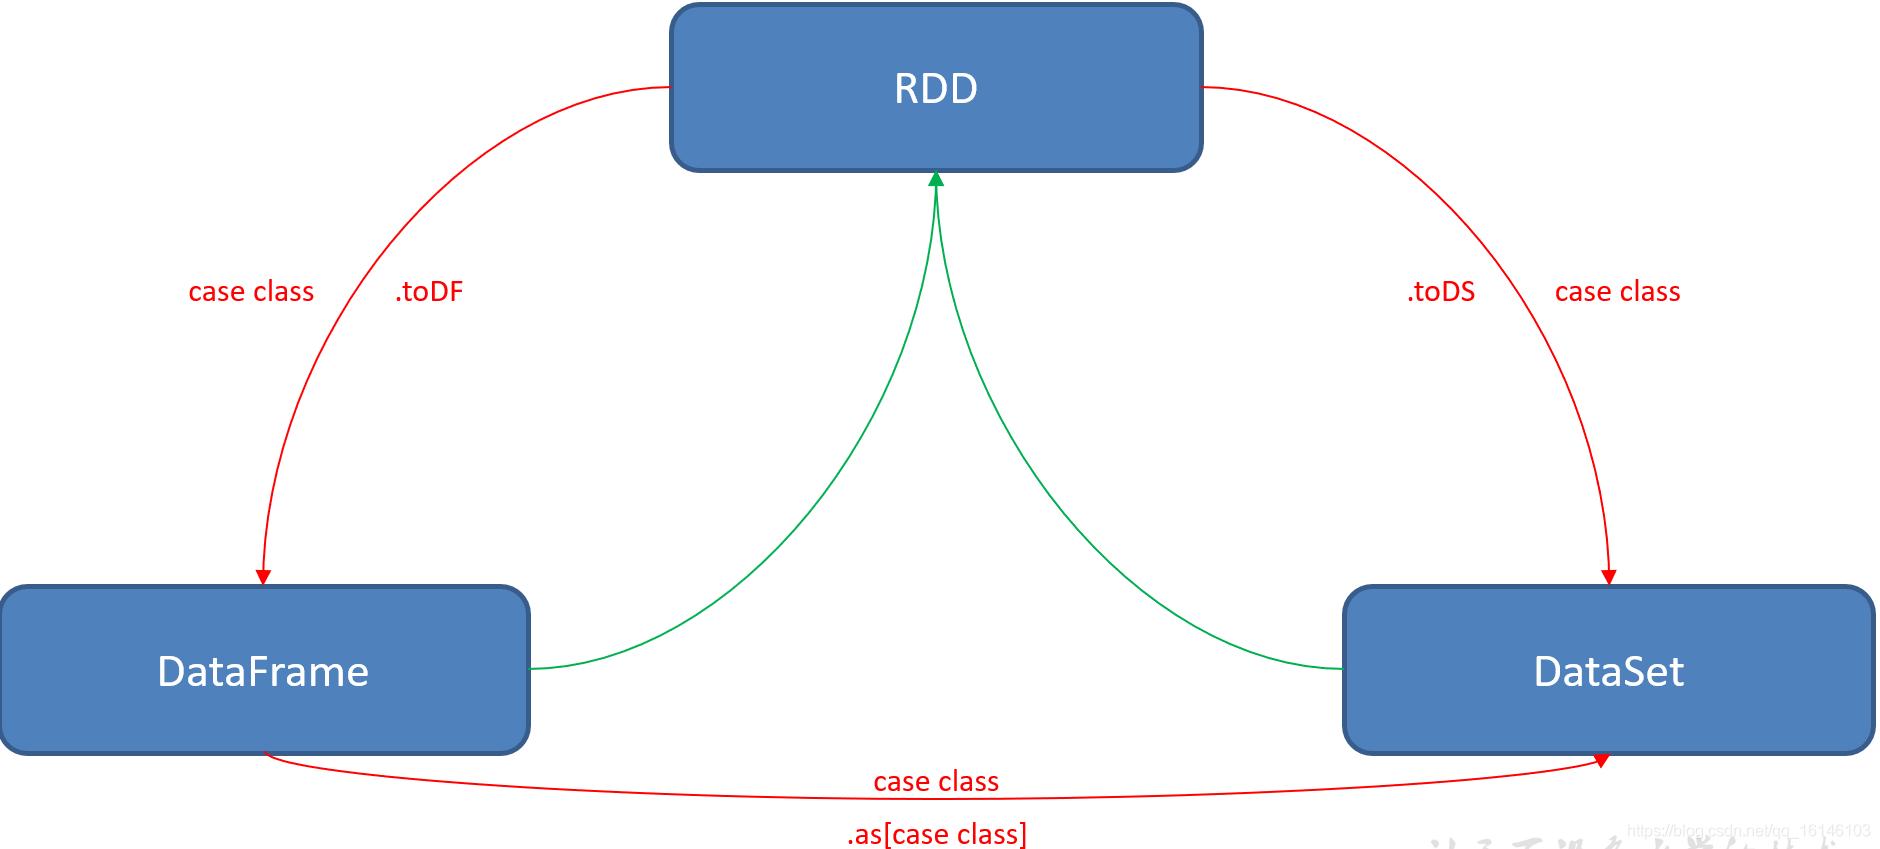 Spark SQL 快速入门系列(4) | RDD、DataFrame、DataSet三者的共性和区别不温卜火-